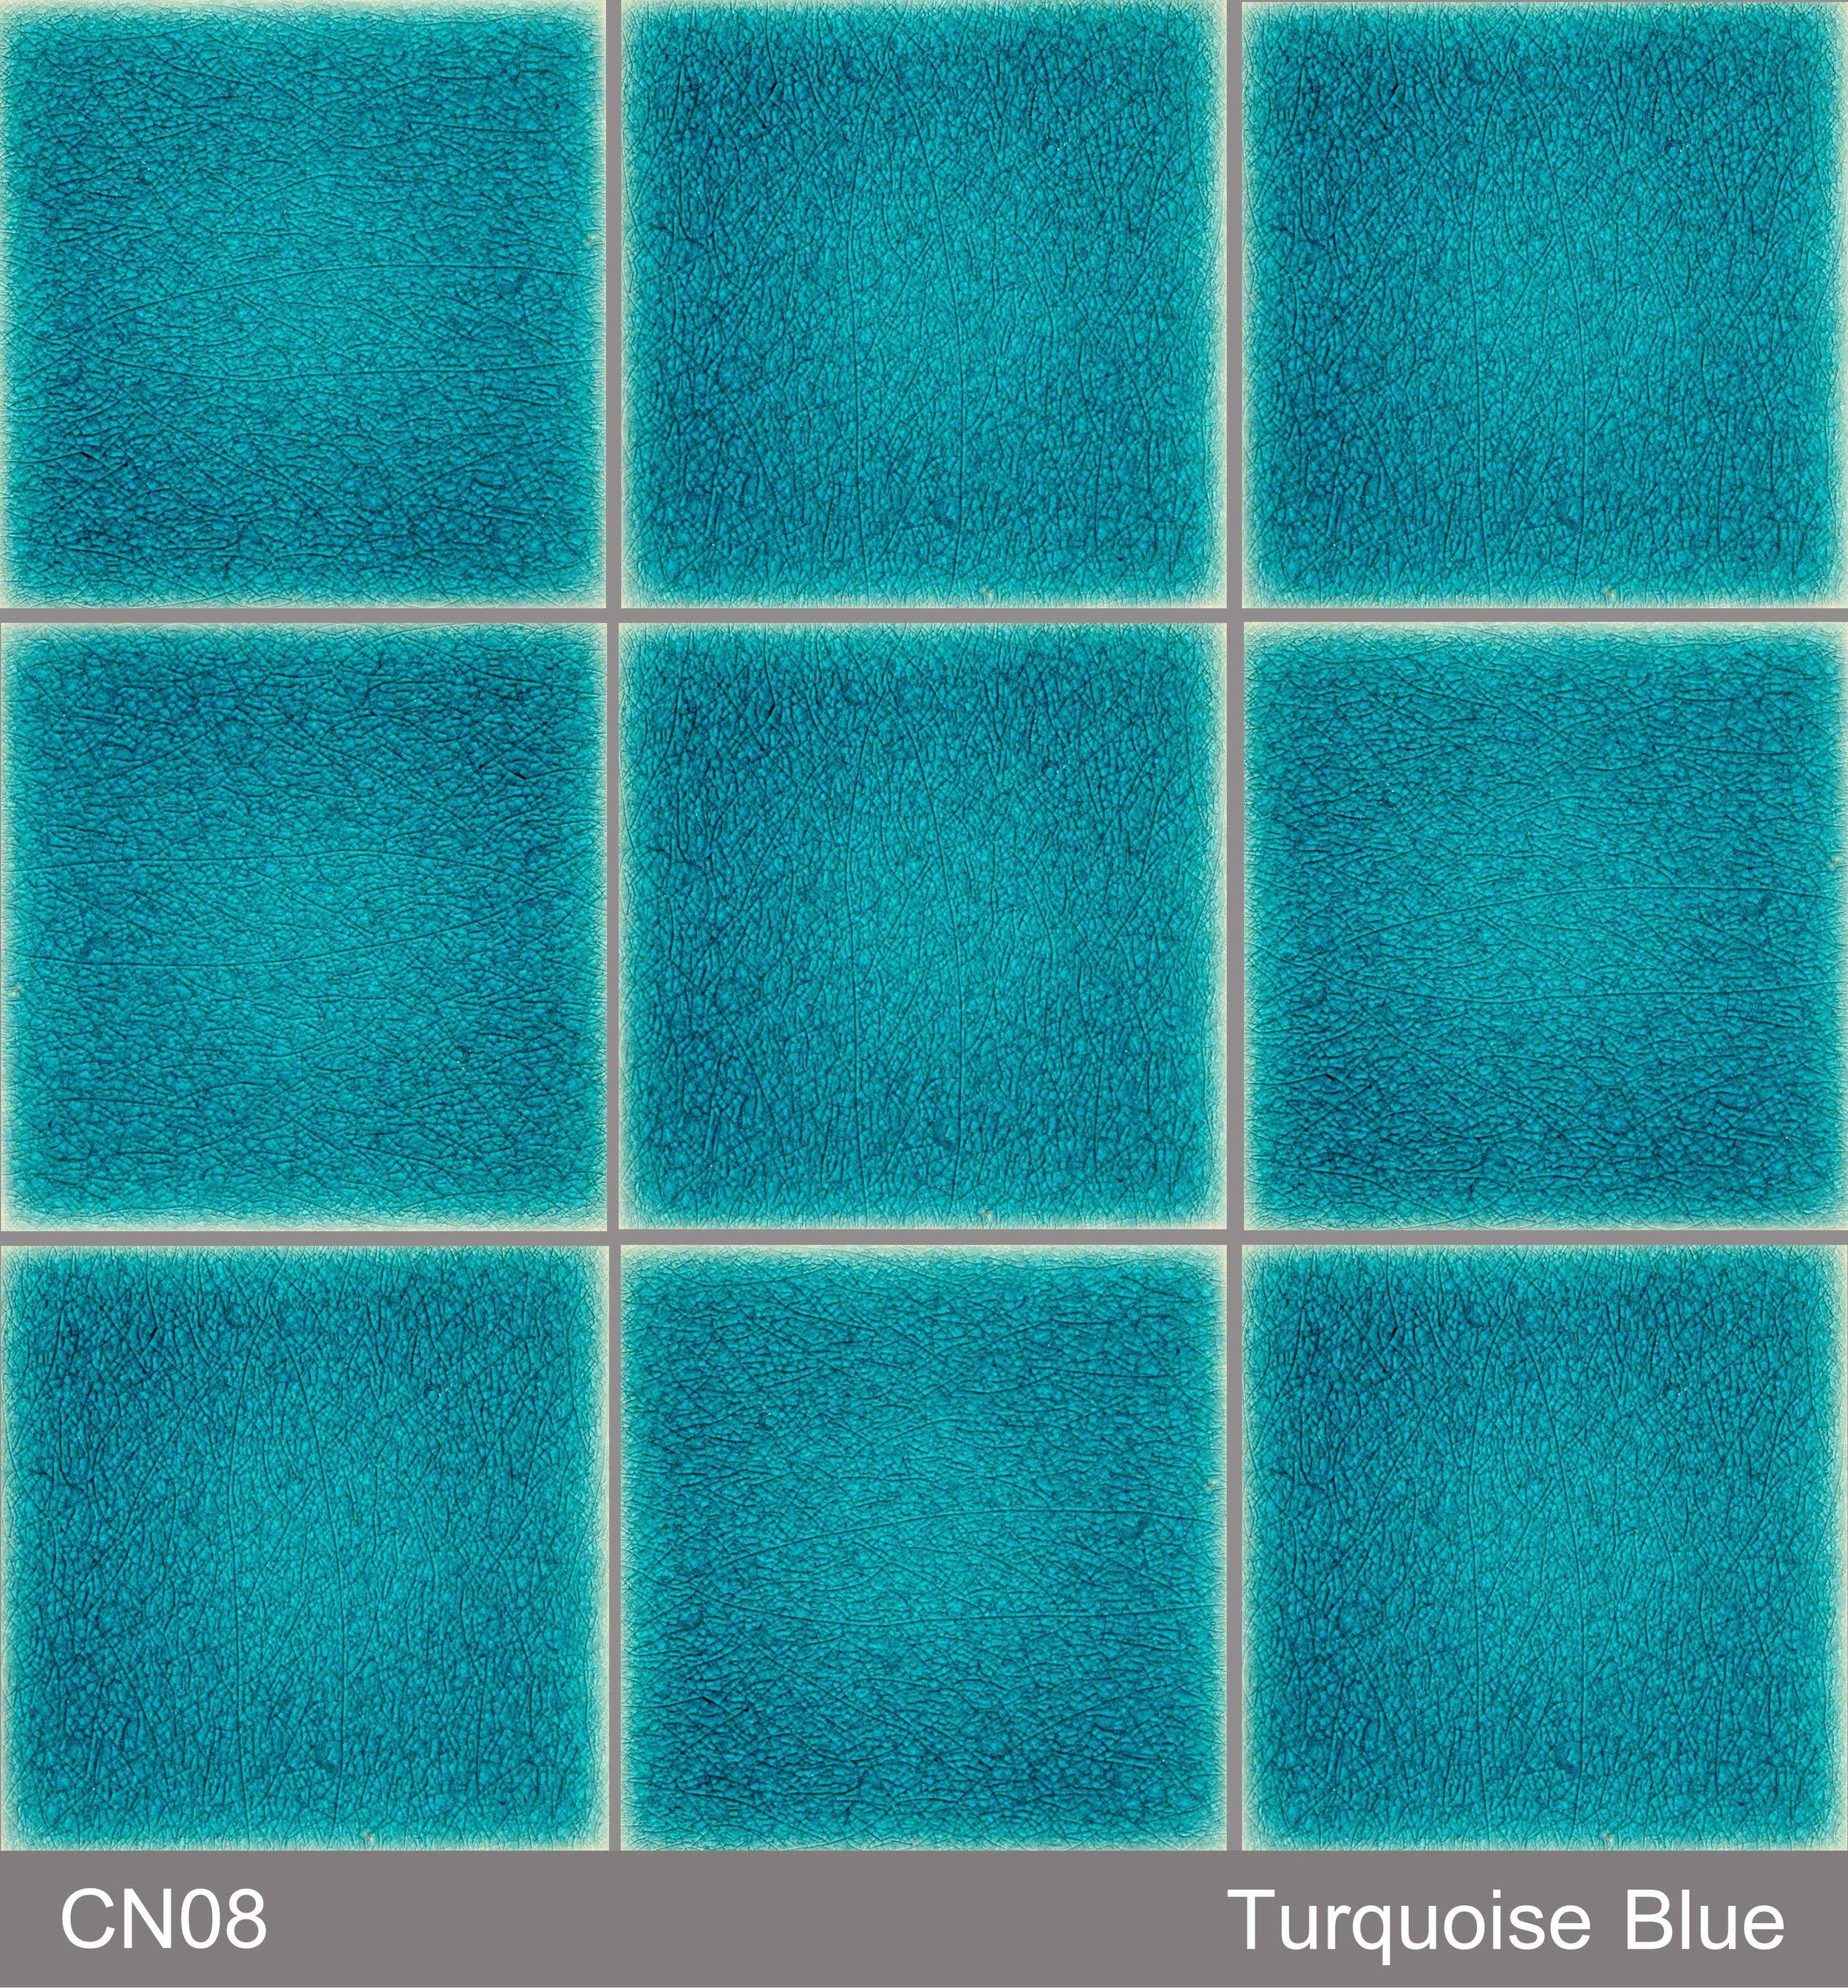 CN08 : Turquoise blue